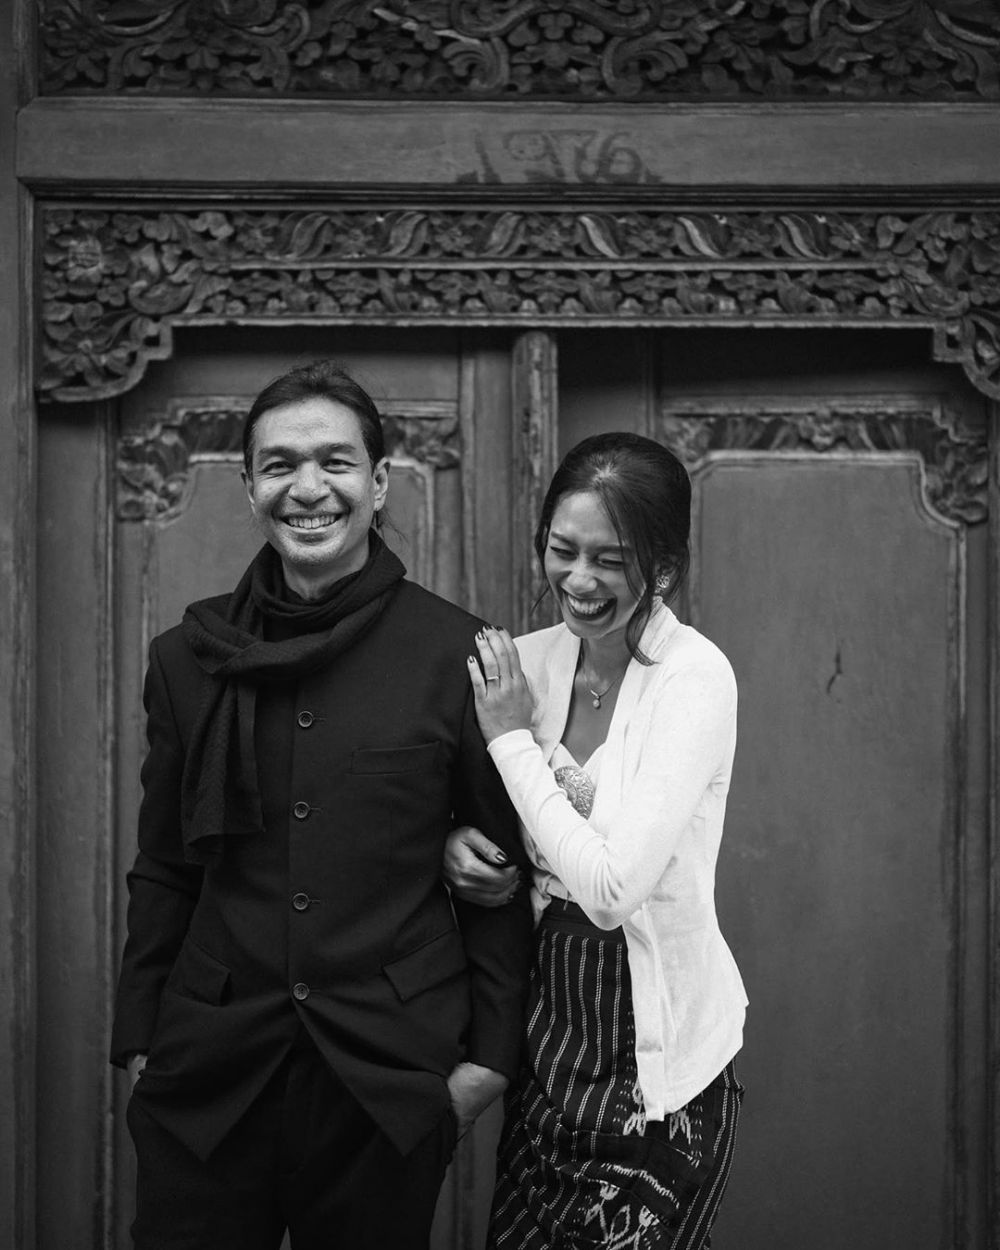 Potret bersama Dimas Djay dan Faradina Instagram